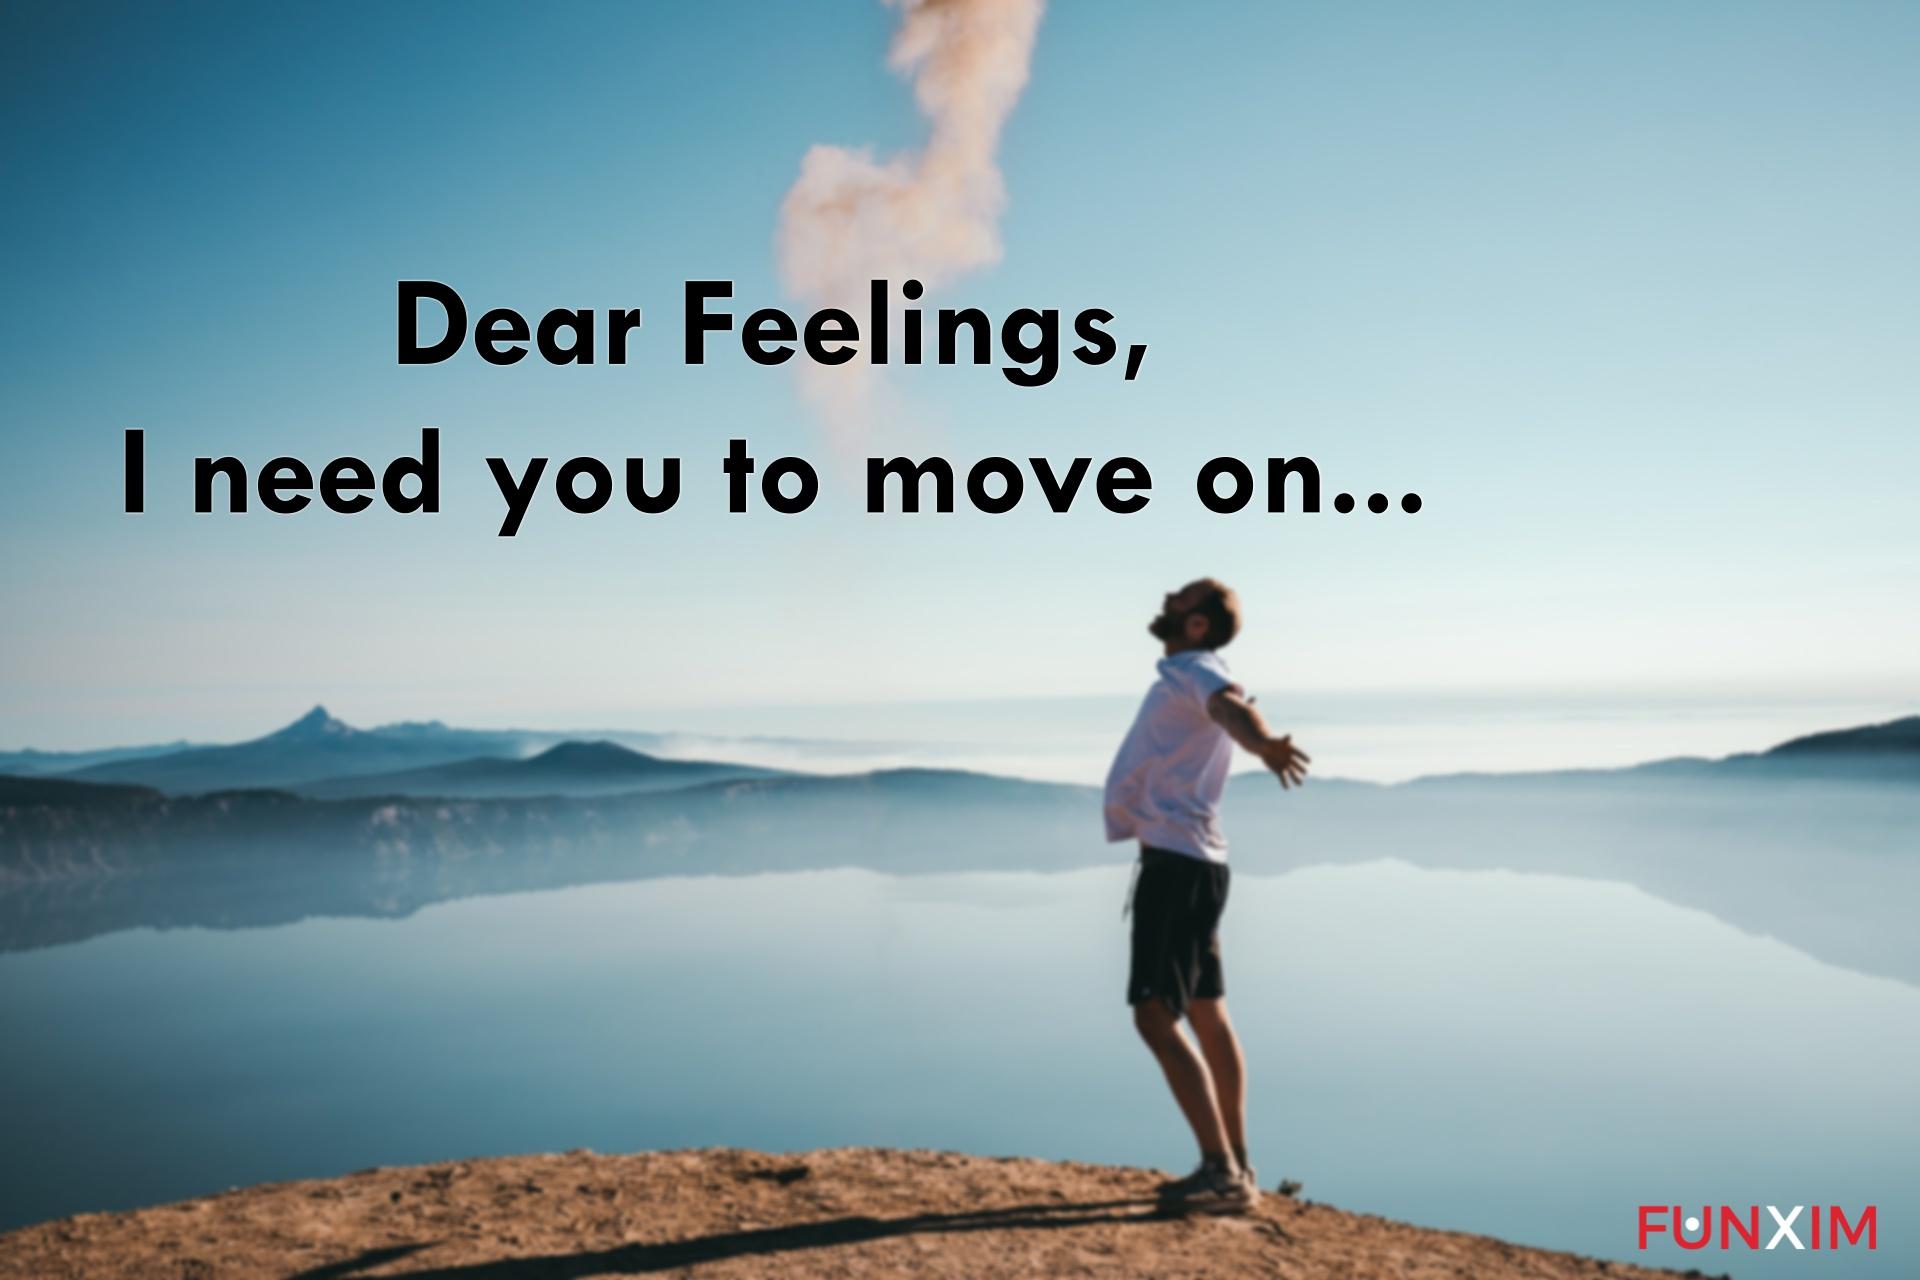 Dear Feelings, I need you to move on.